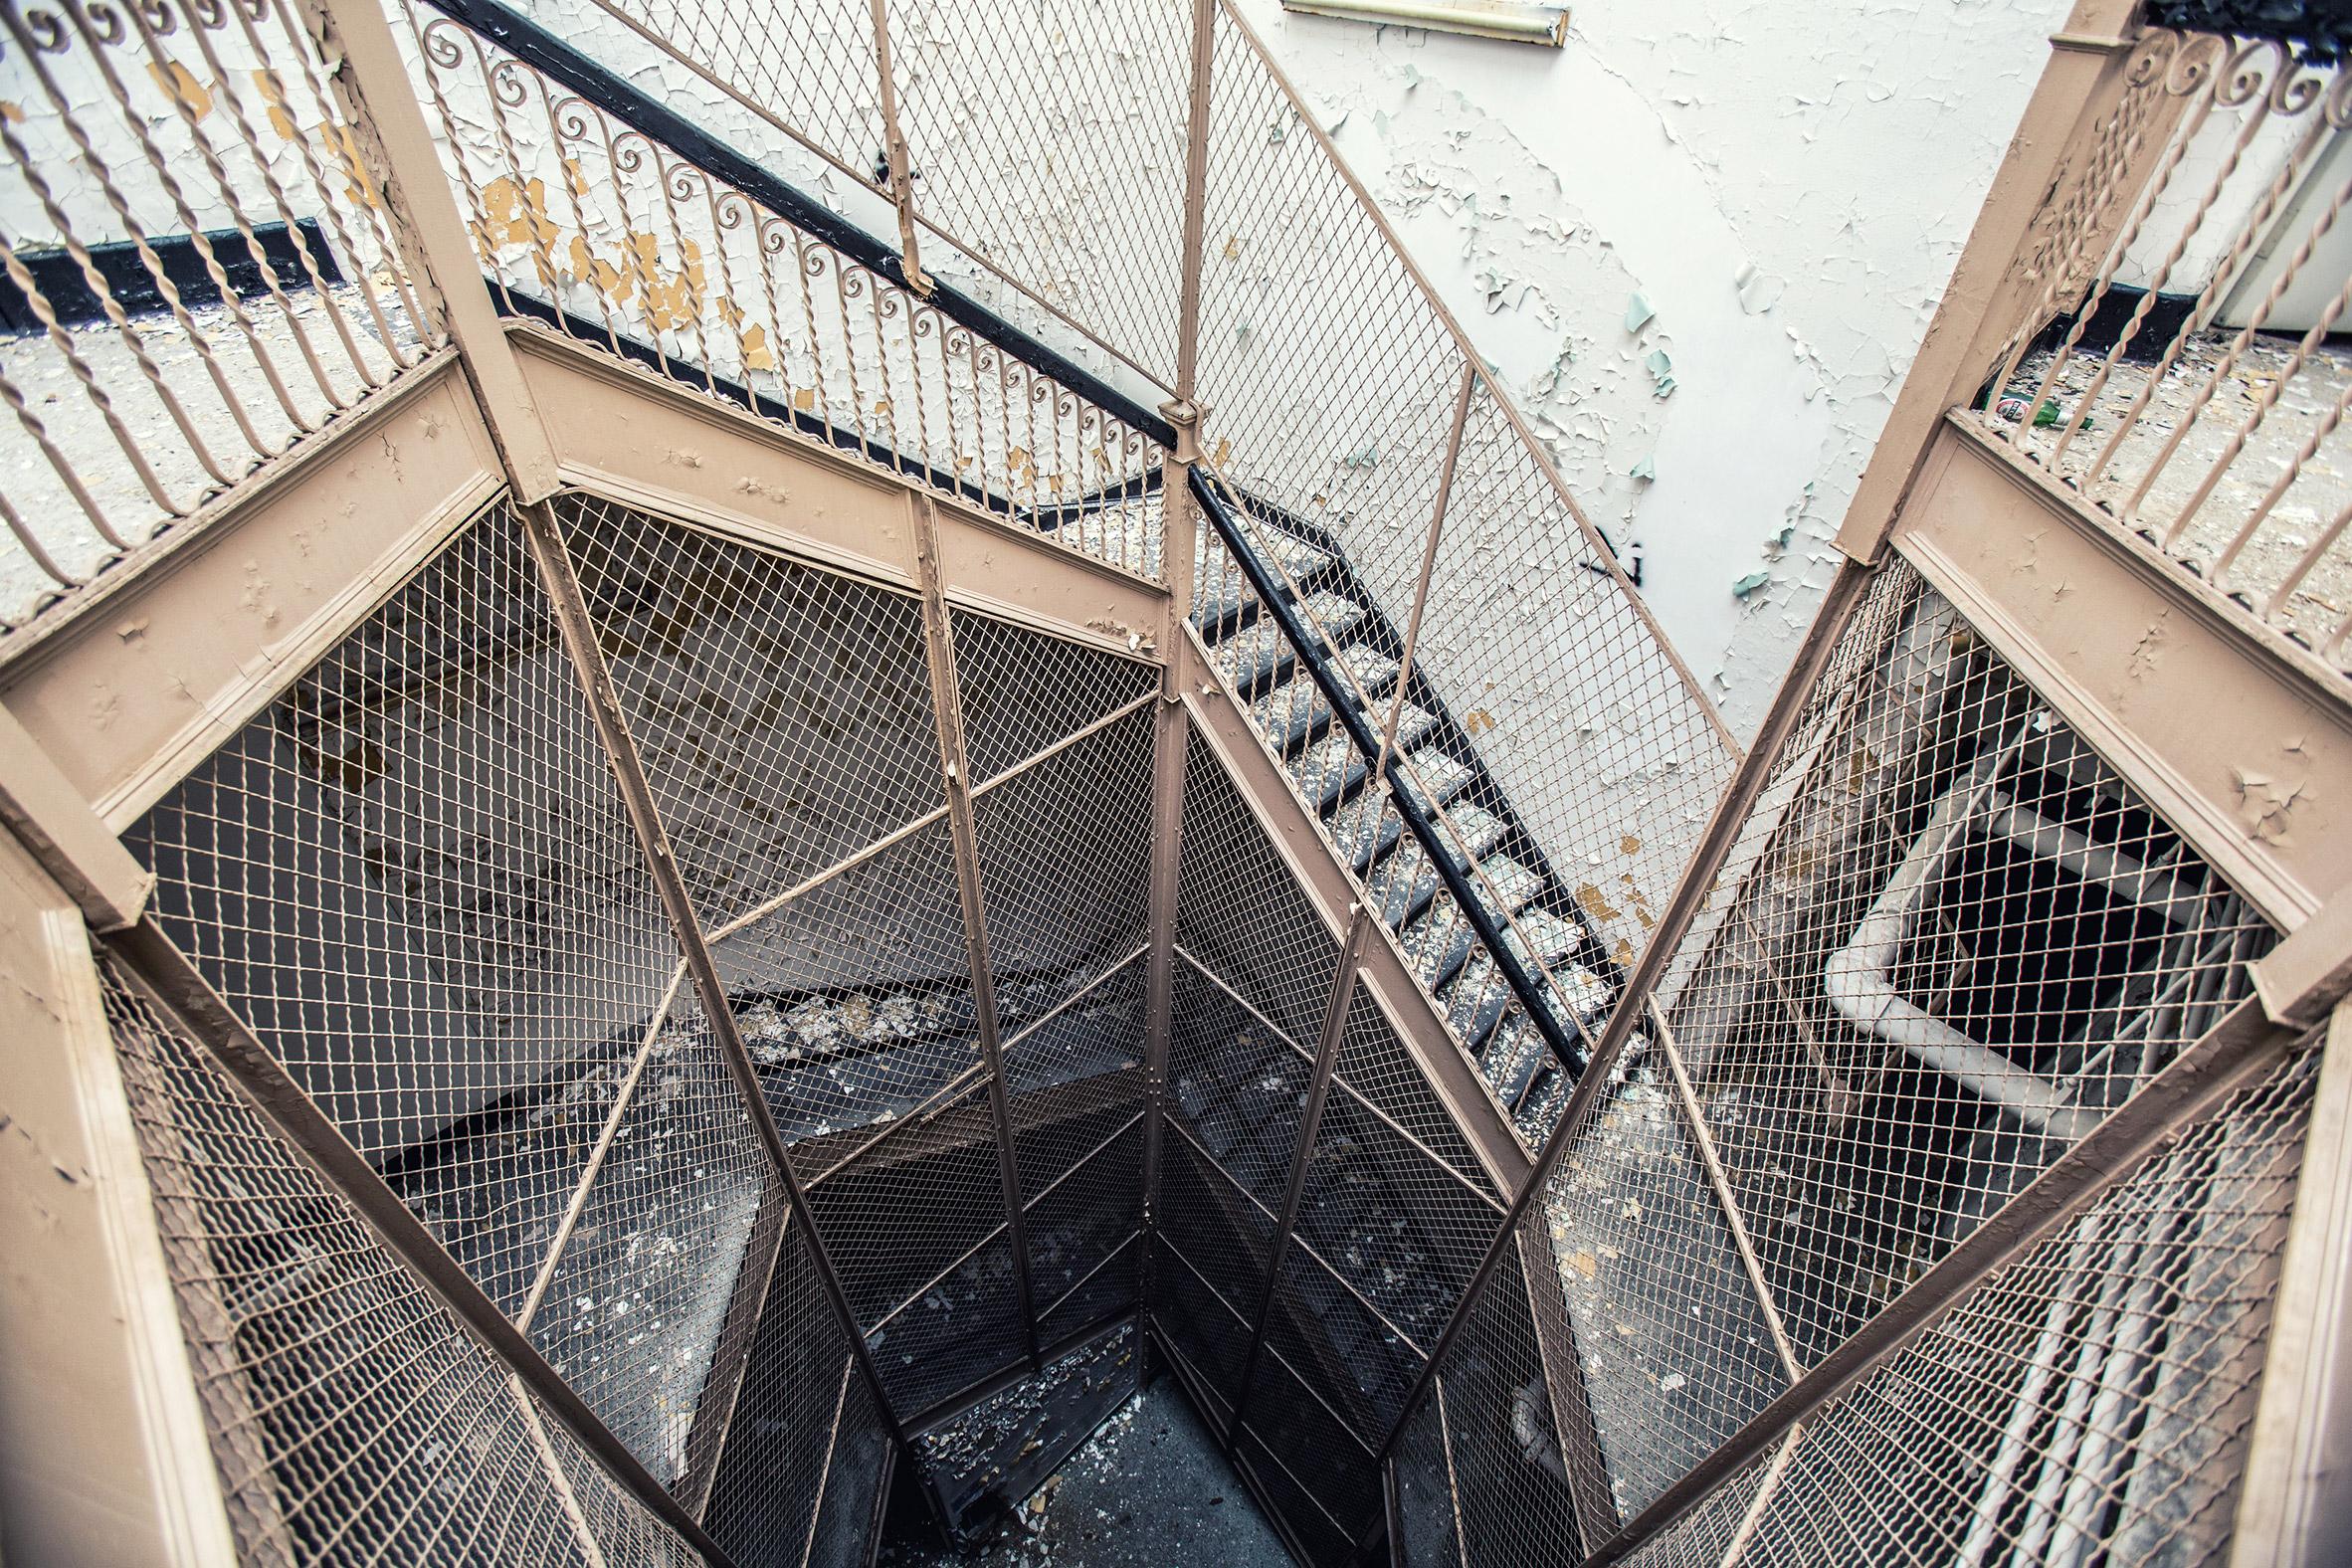 Abandoned-Asylums-11.jpg